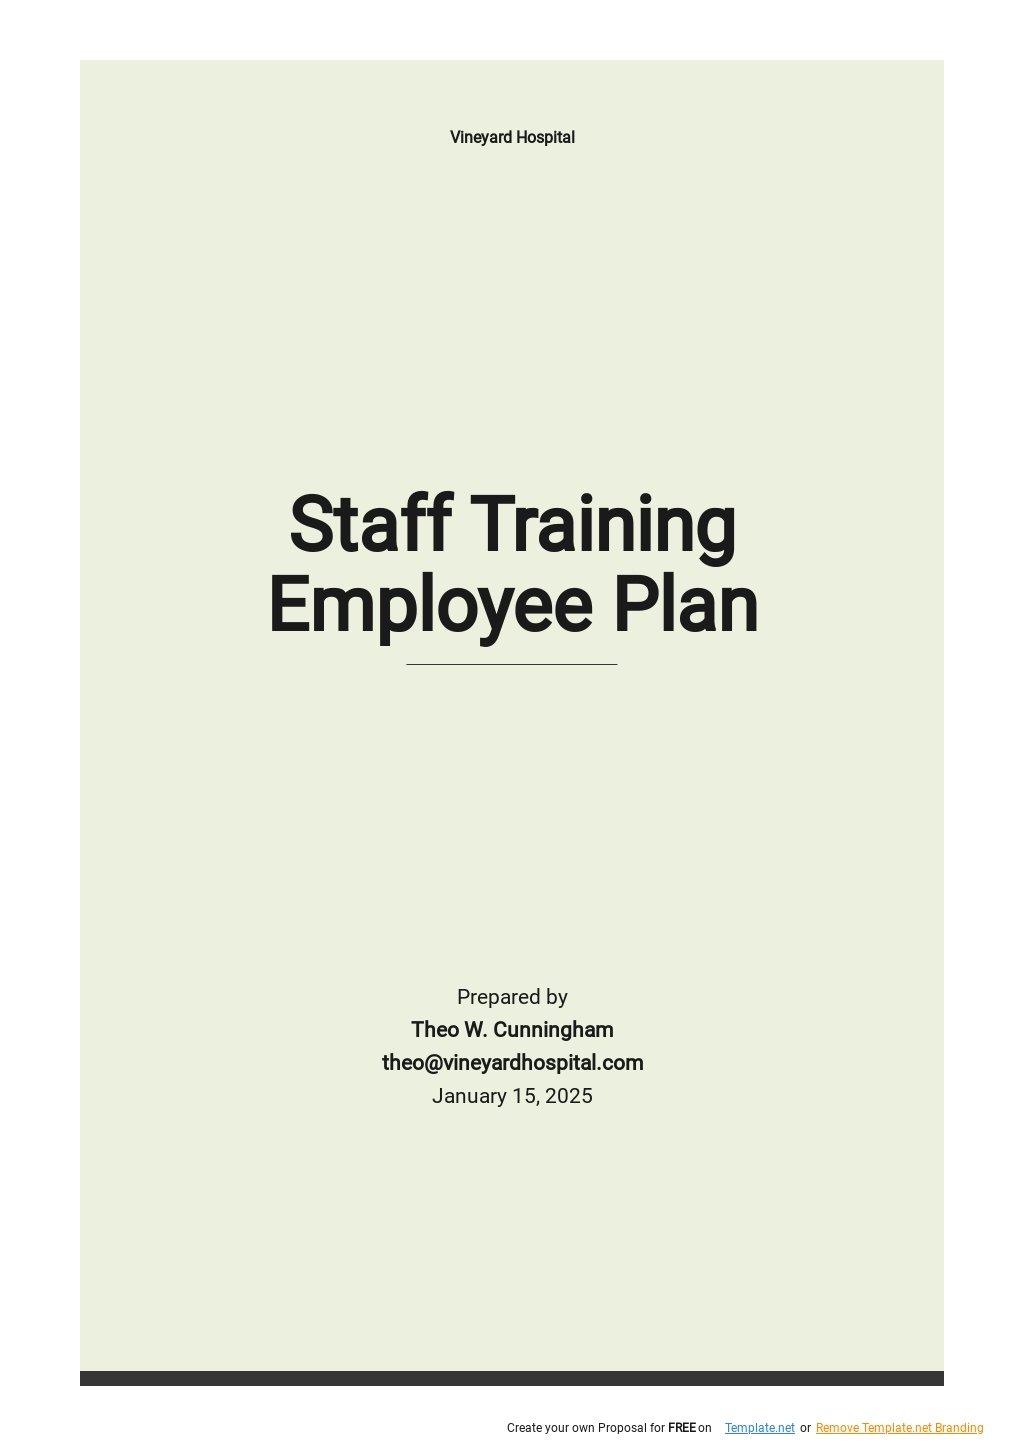 Staff Training Employee Training Plan Template.jpe